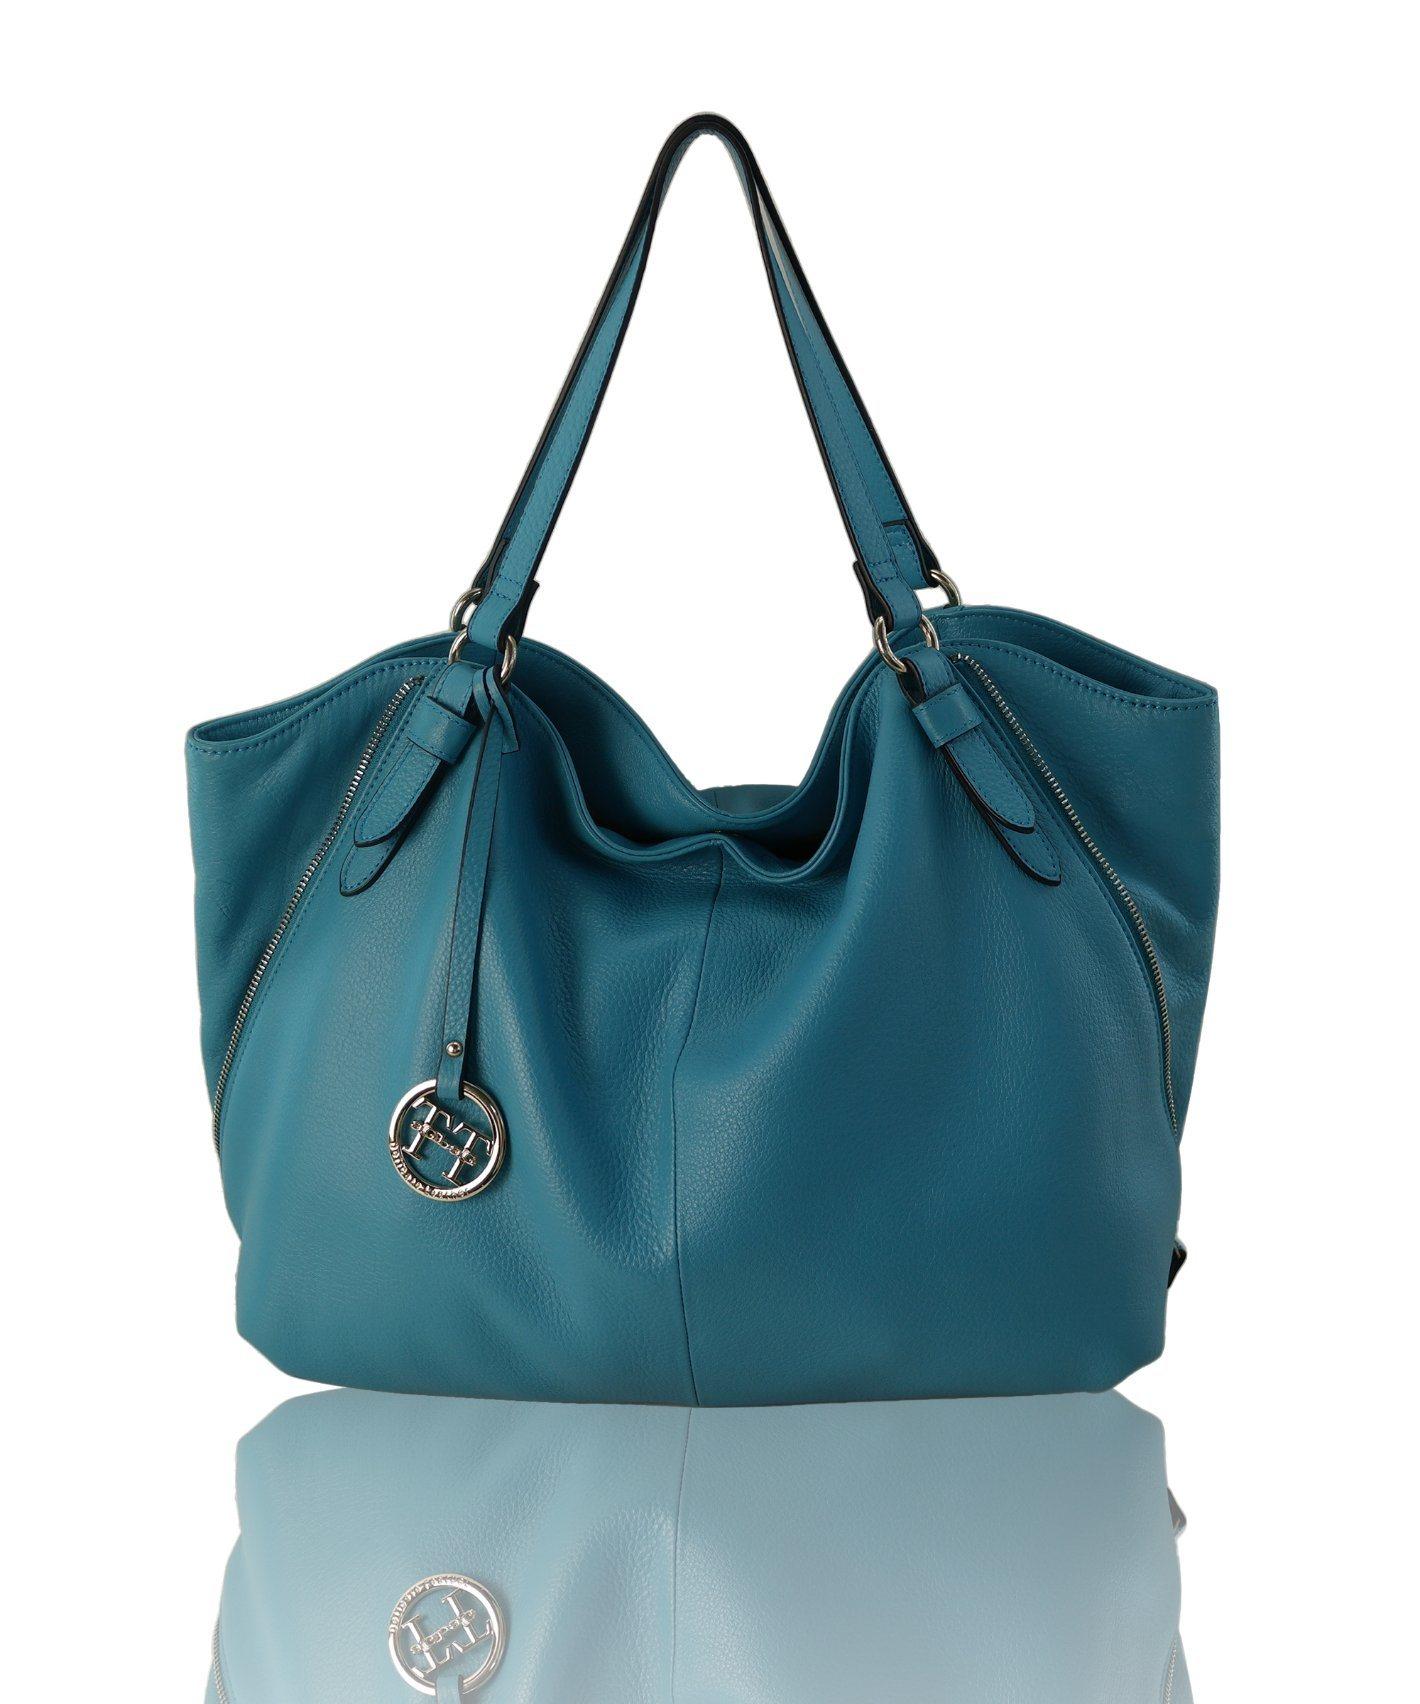 Hand Newest High Quality Designer Leather Ladies Handbag